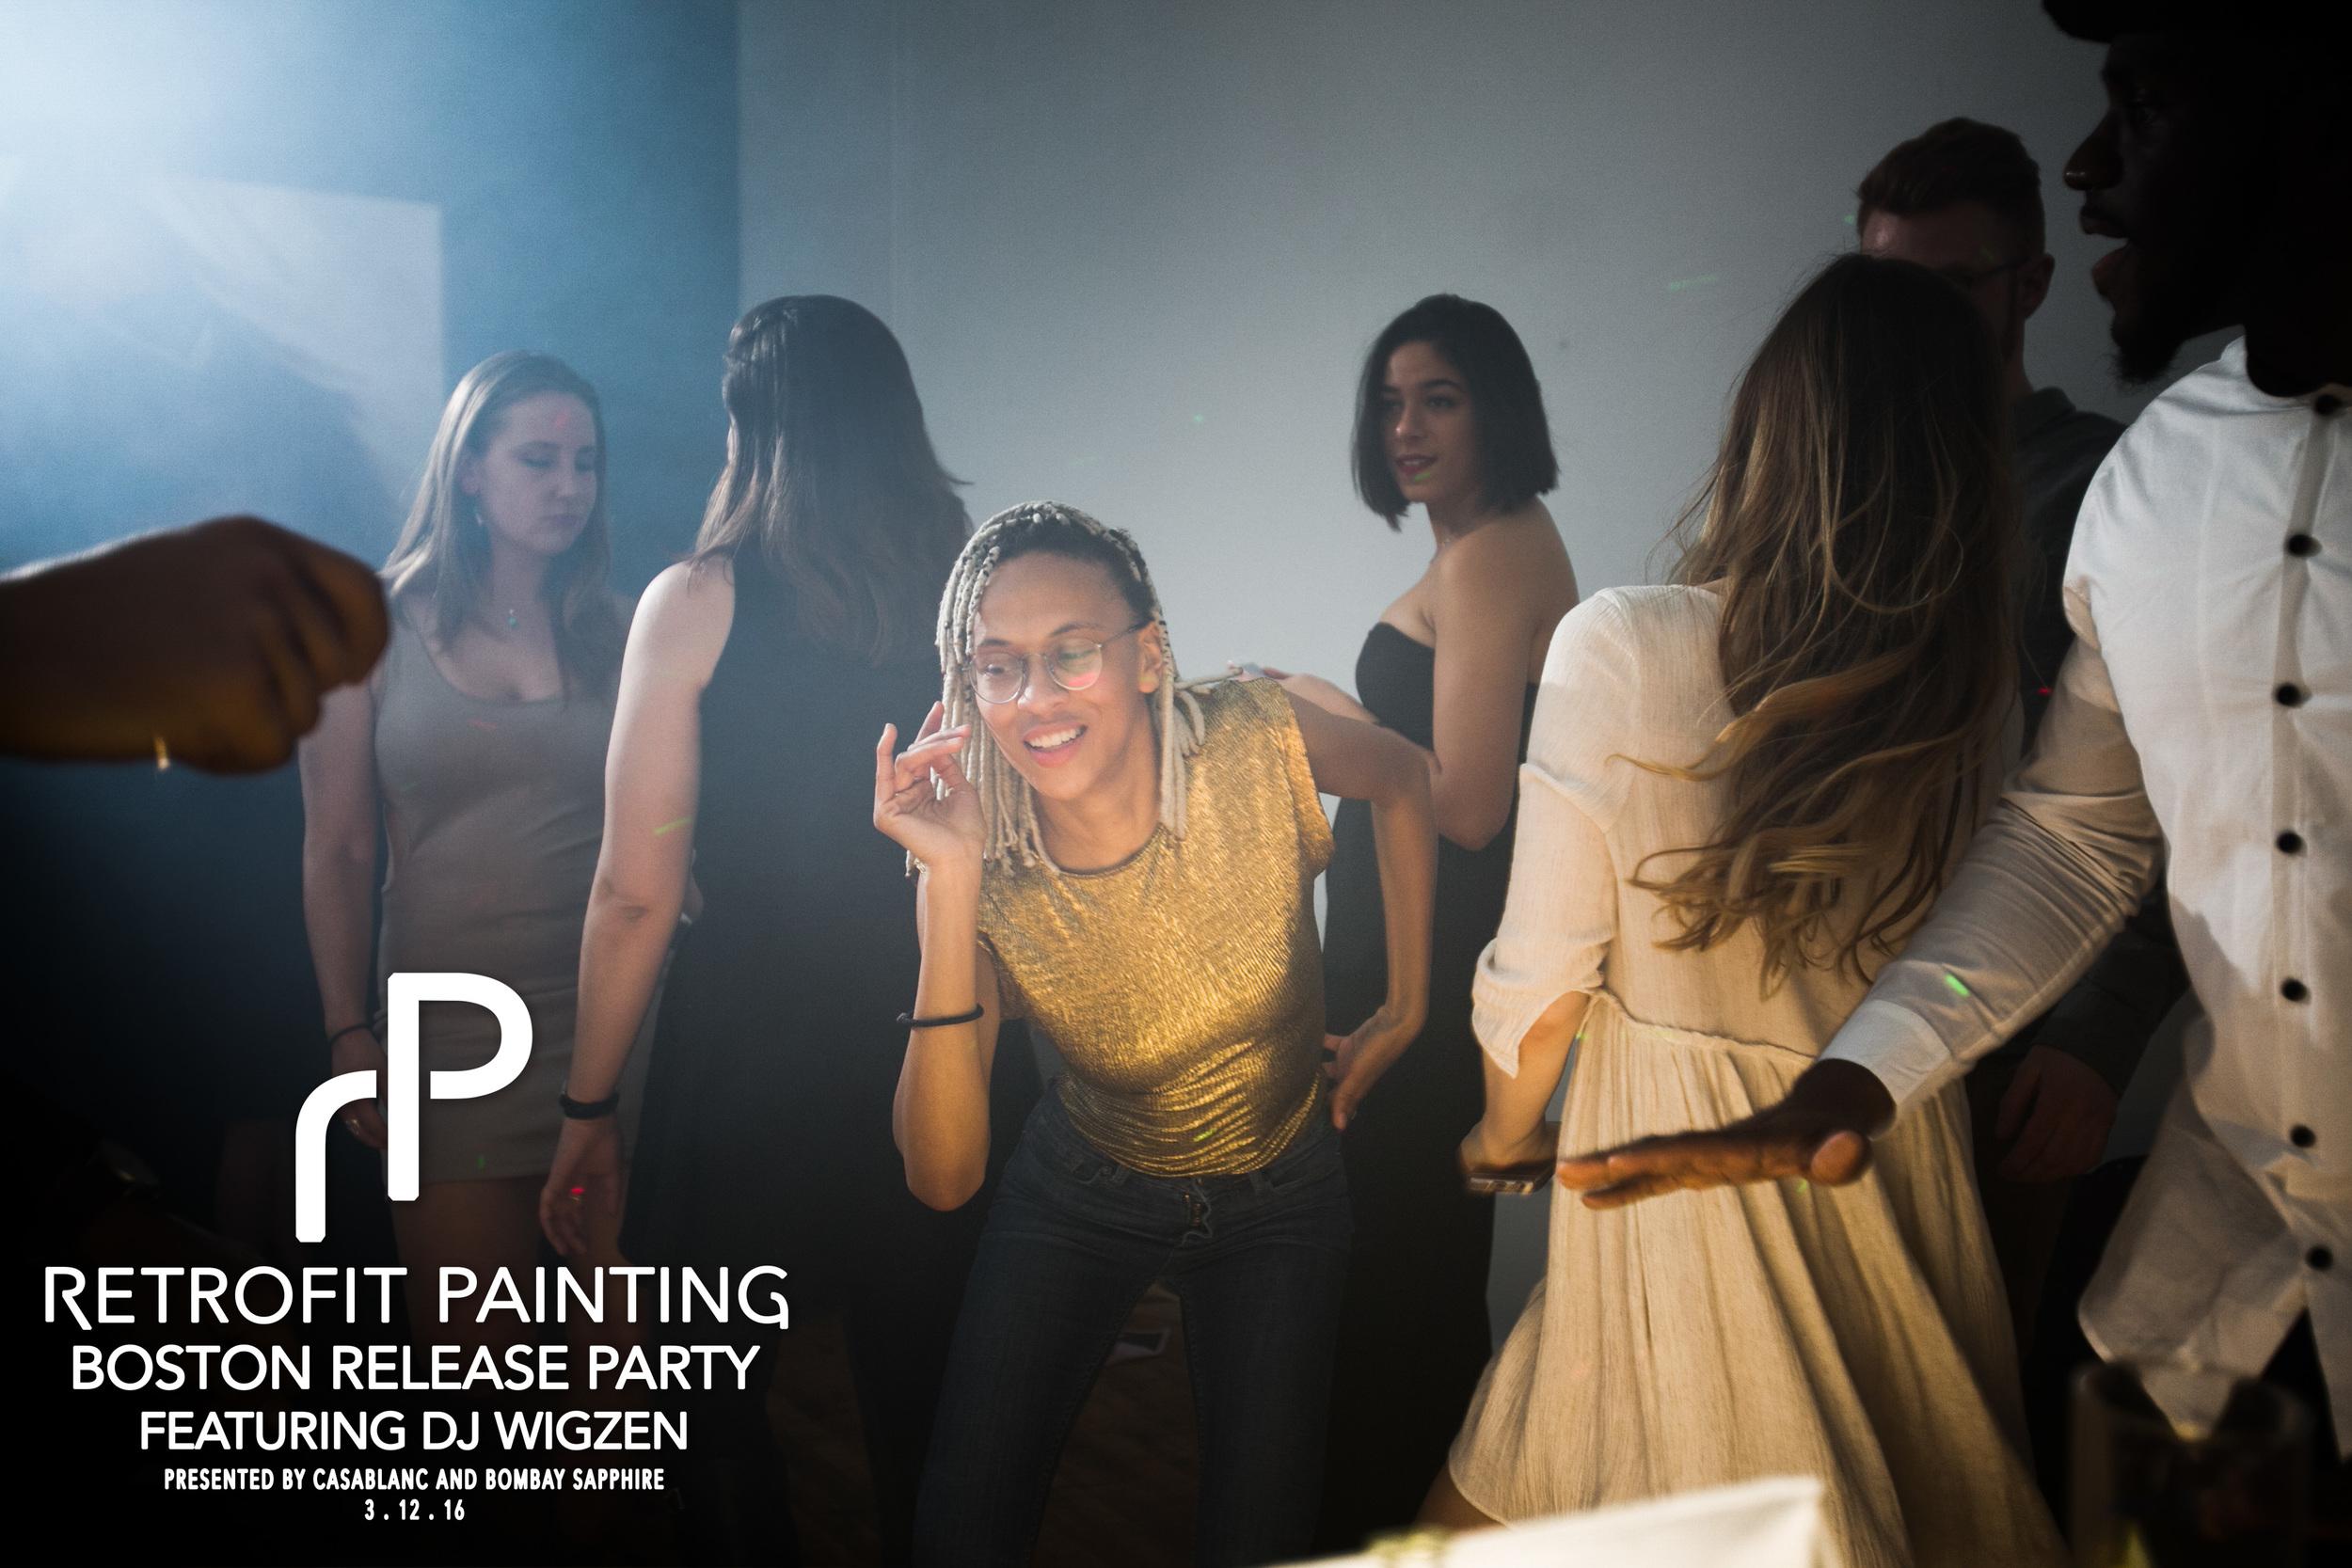 Retrofit Painting Boston Release Party 0176.jpg